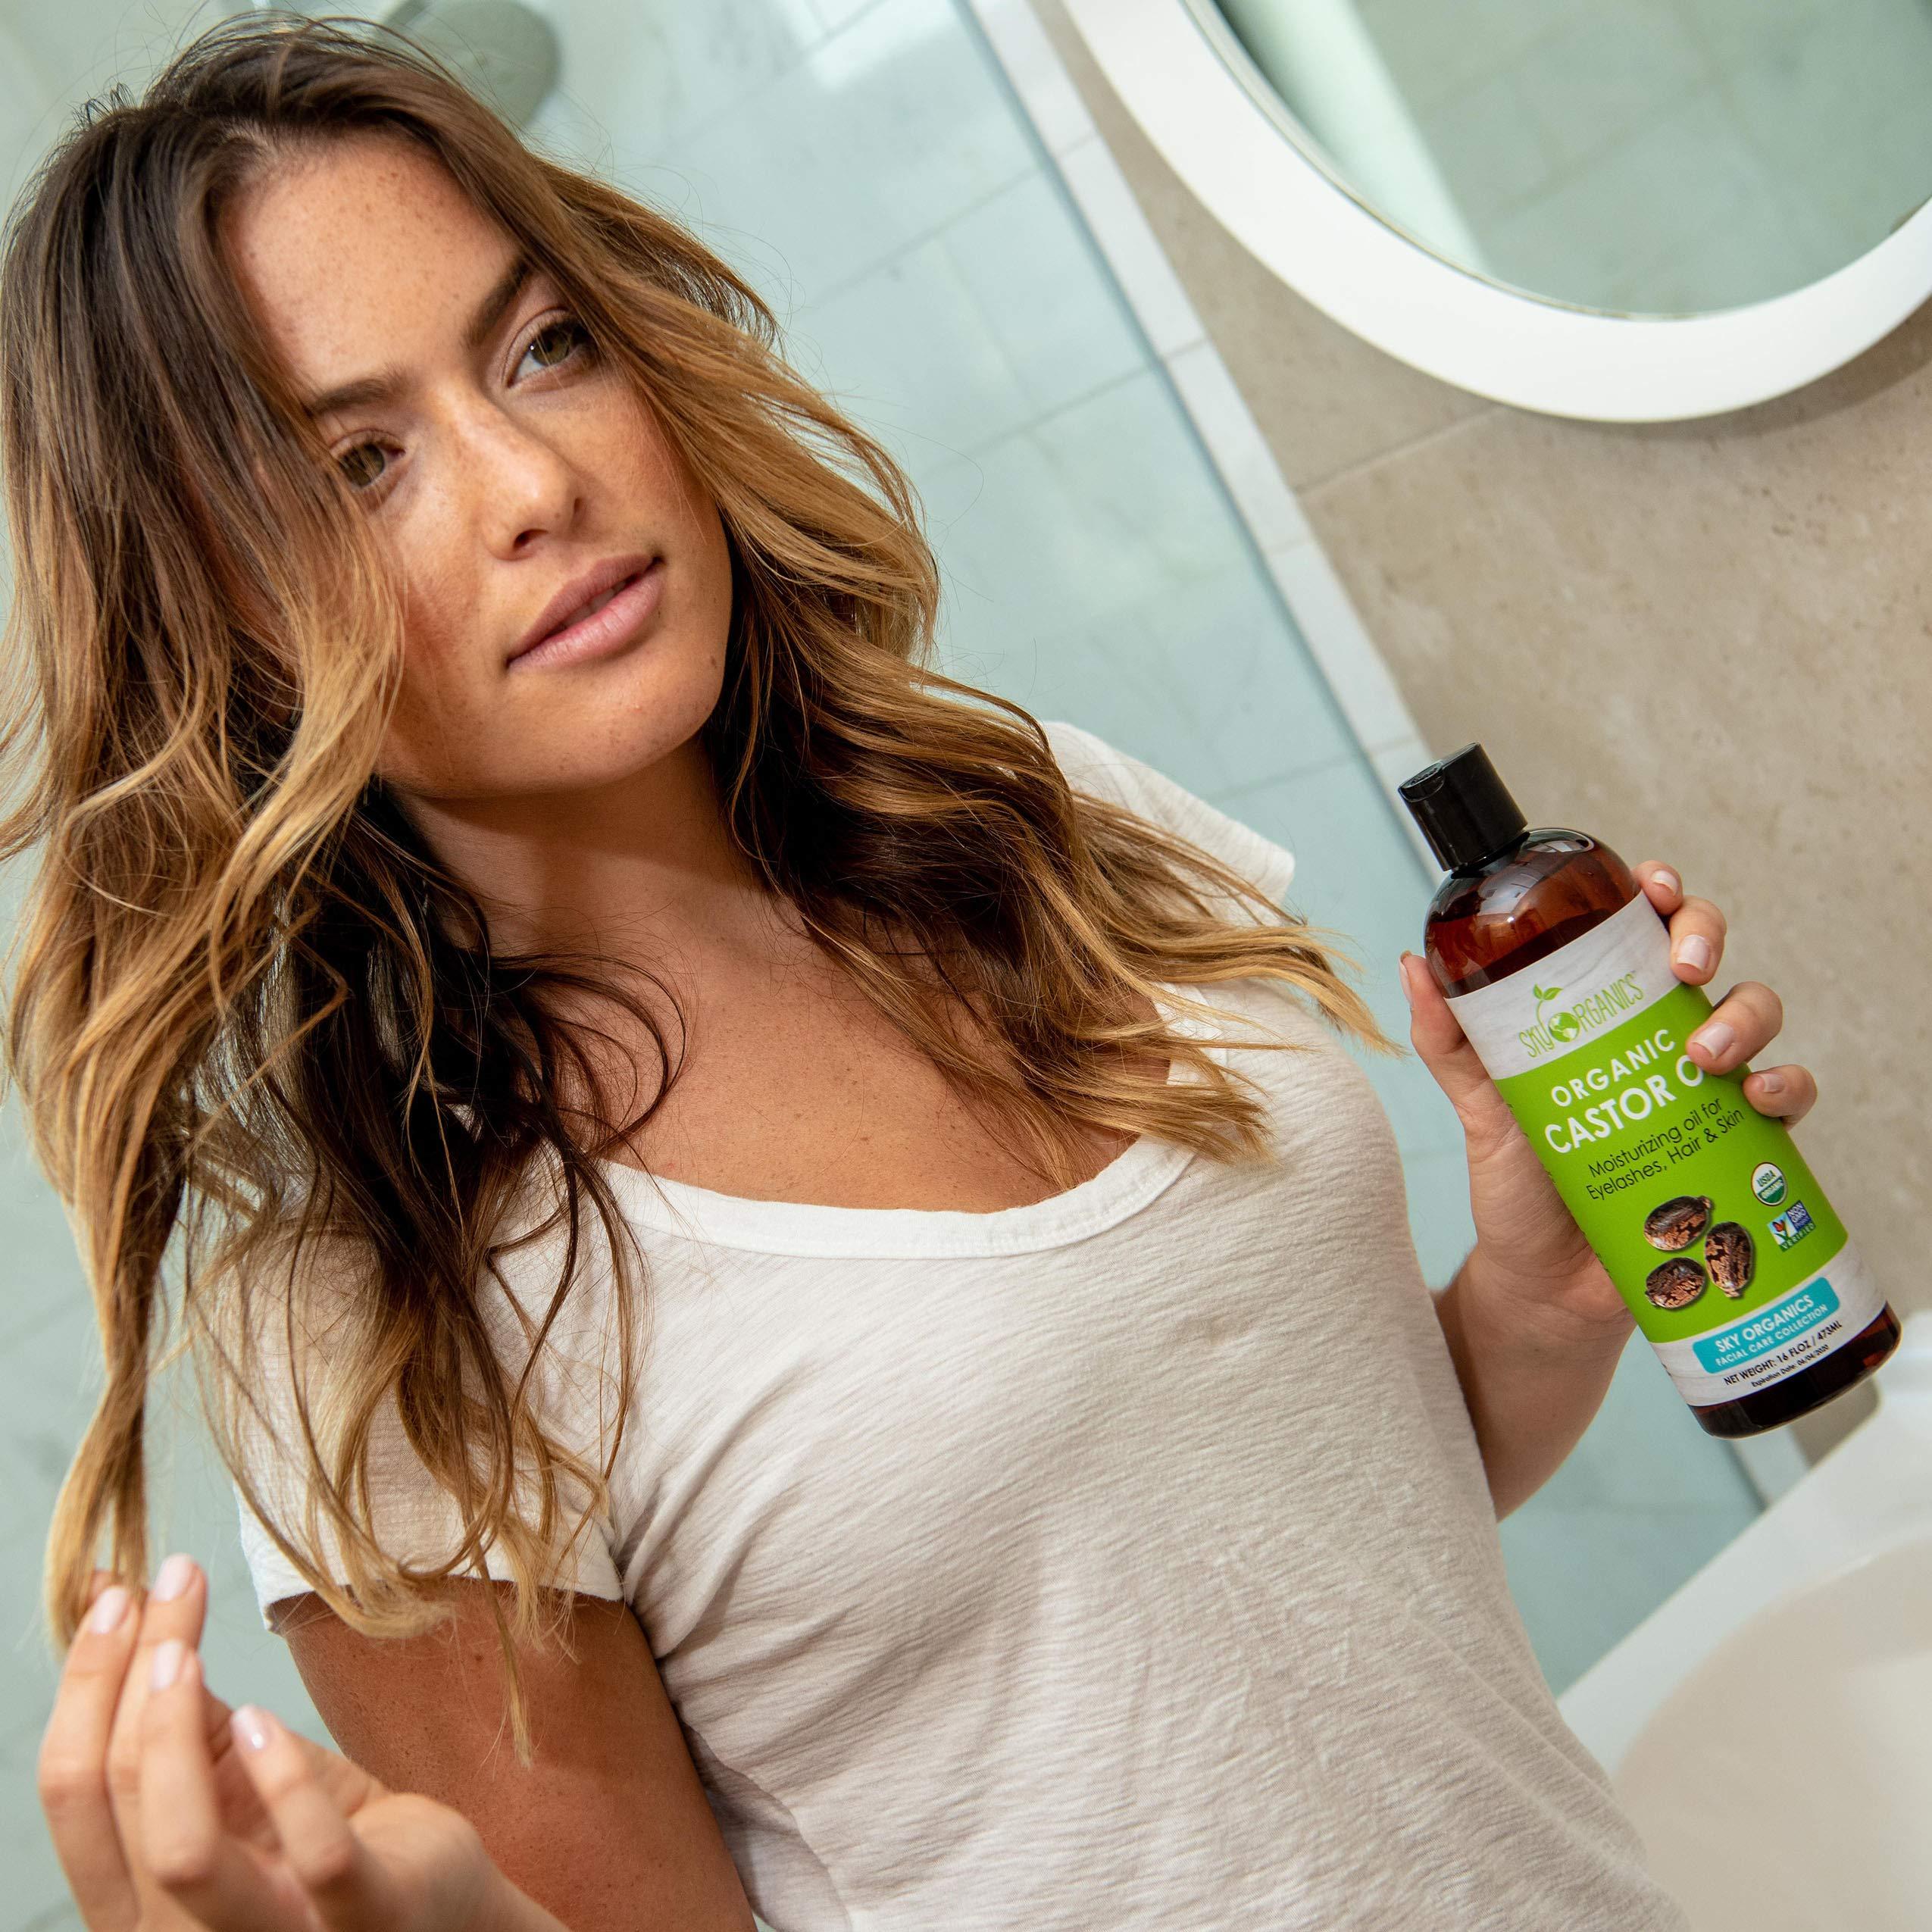 Castor Oil (16oz) USDA Organic Cold-Pressed, 100% Pure, Hexane-Free Castor Oil - Moisturizing & Healing, For Dry Skin, Hair Growth - For Skin, Hair Care, Eyelashes - Caster Oil By Sky Organics by Sky Organics (Image #3)